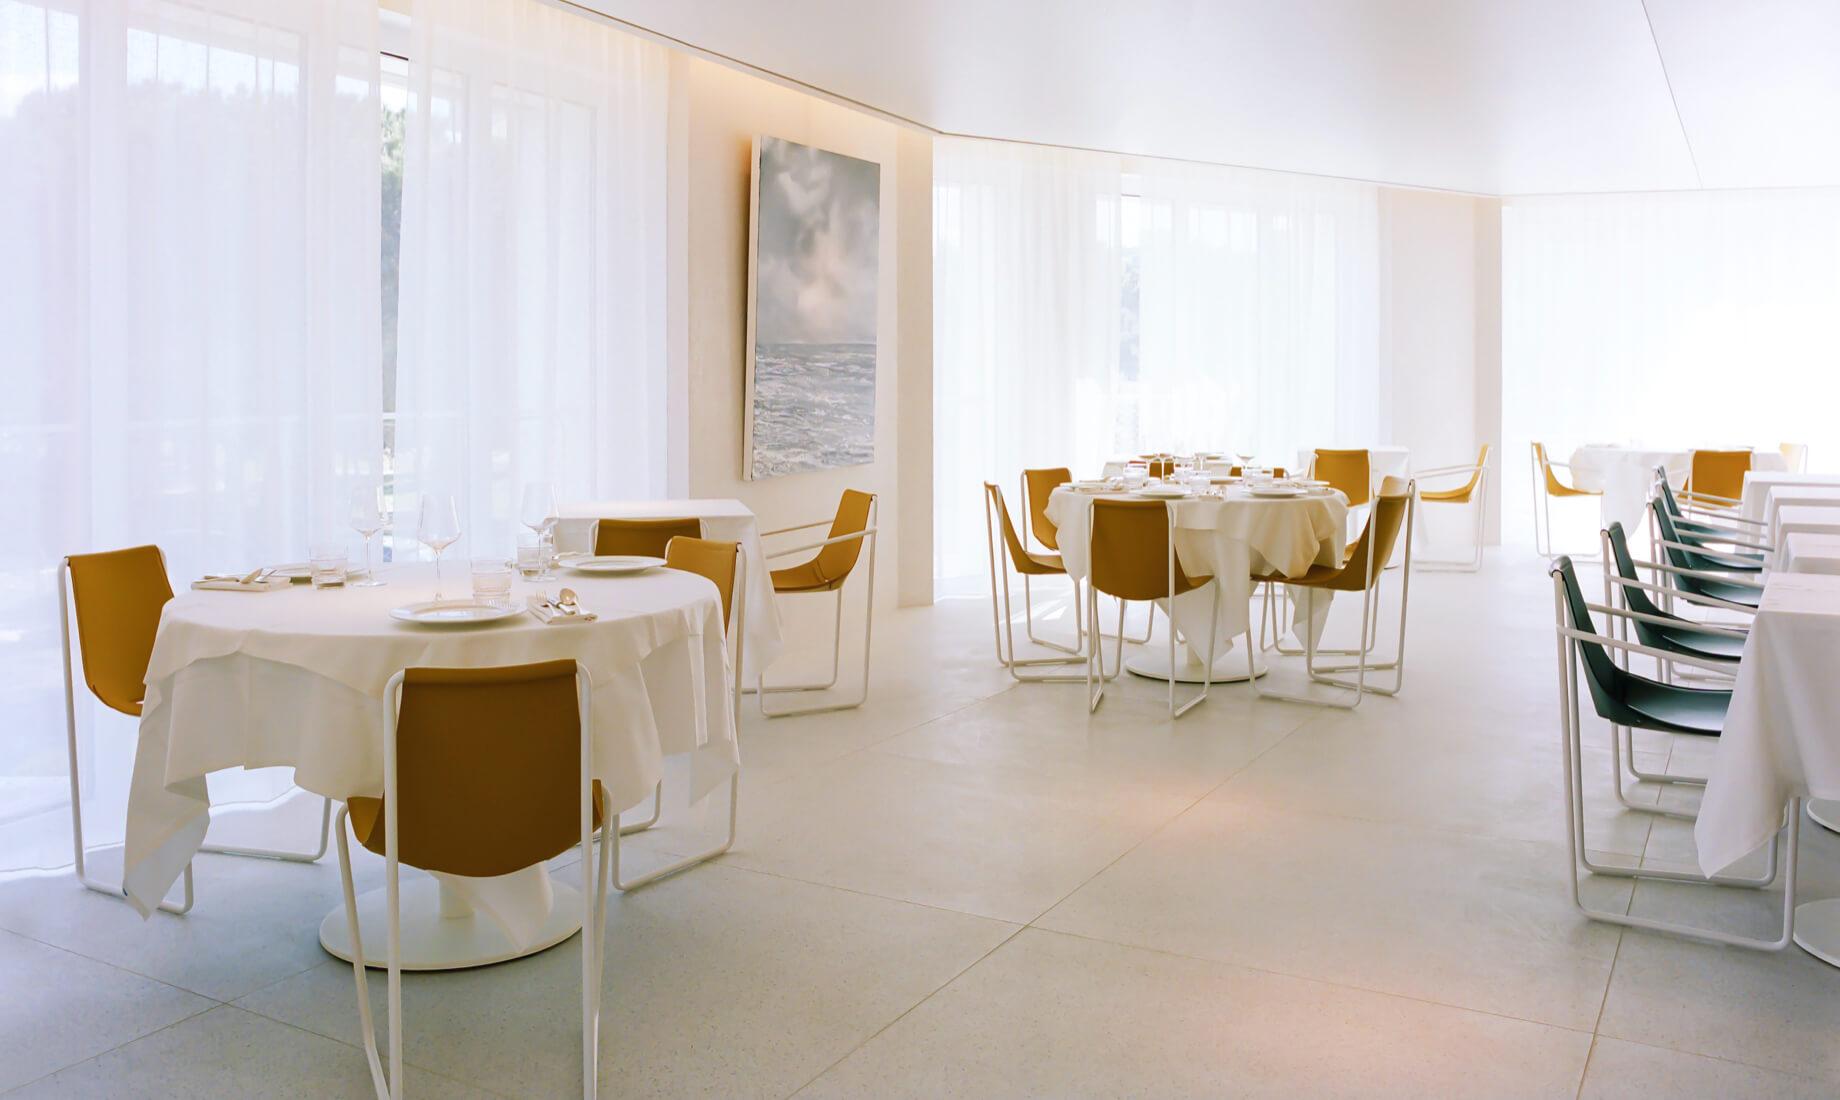 Arredamento ristorante design L'Arbre